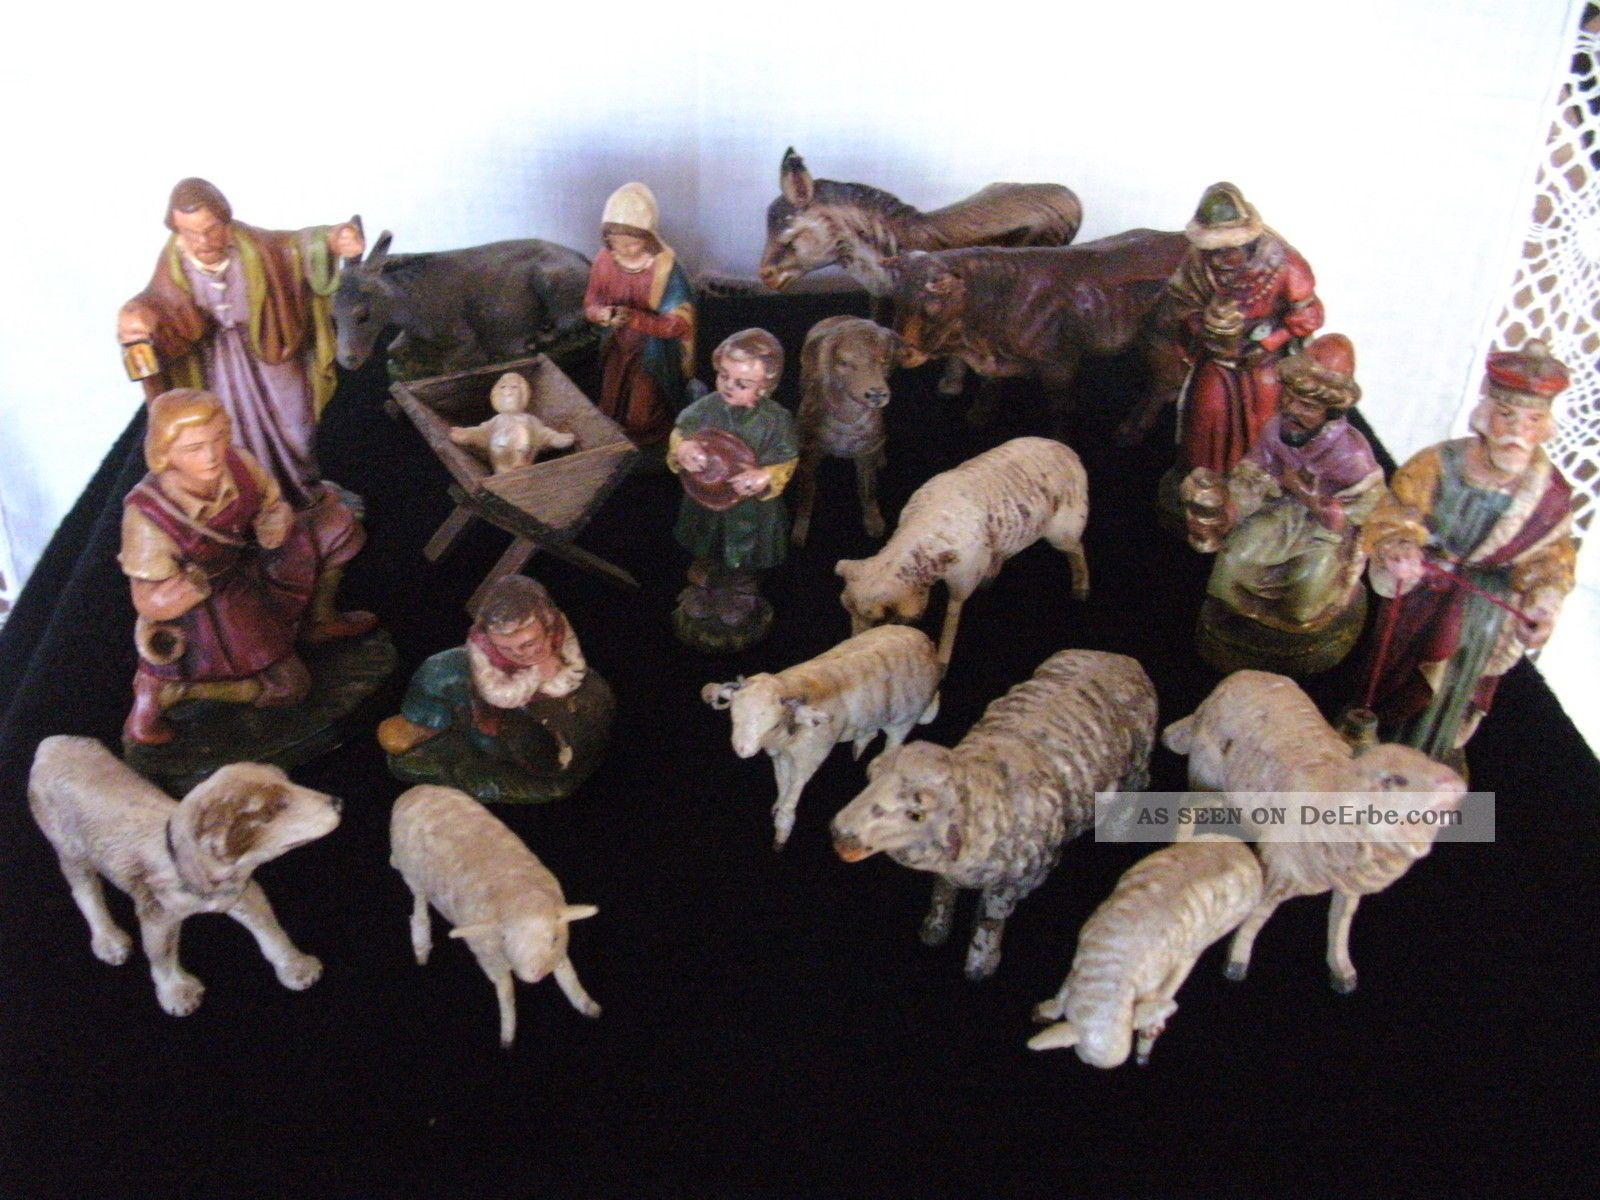 Massefiguren Krippefiguren 20 Figuren Weihnachten Krippe Elastolin & Lineol Bild